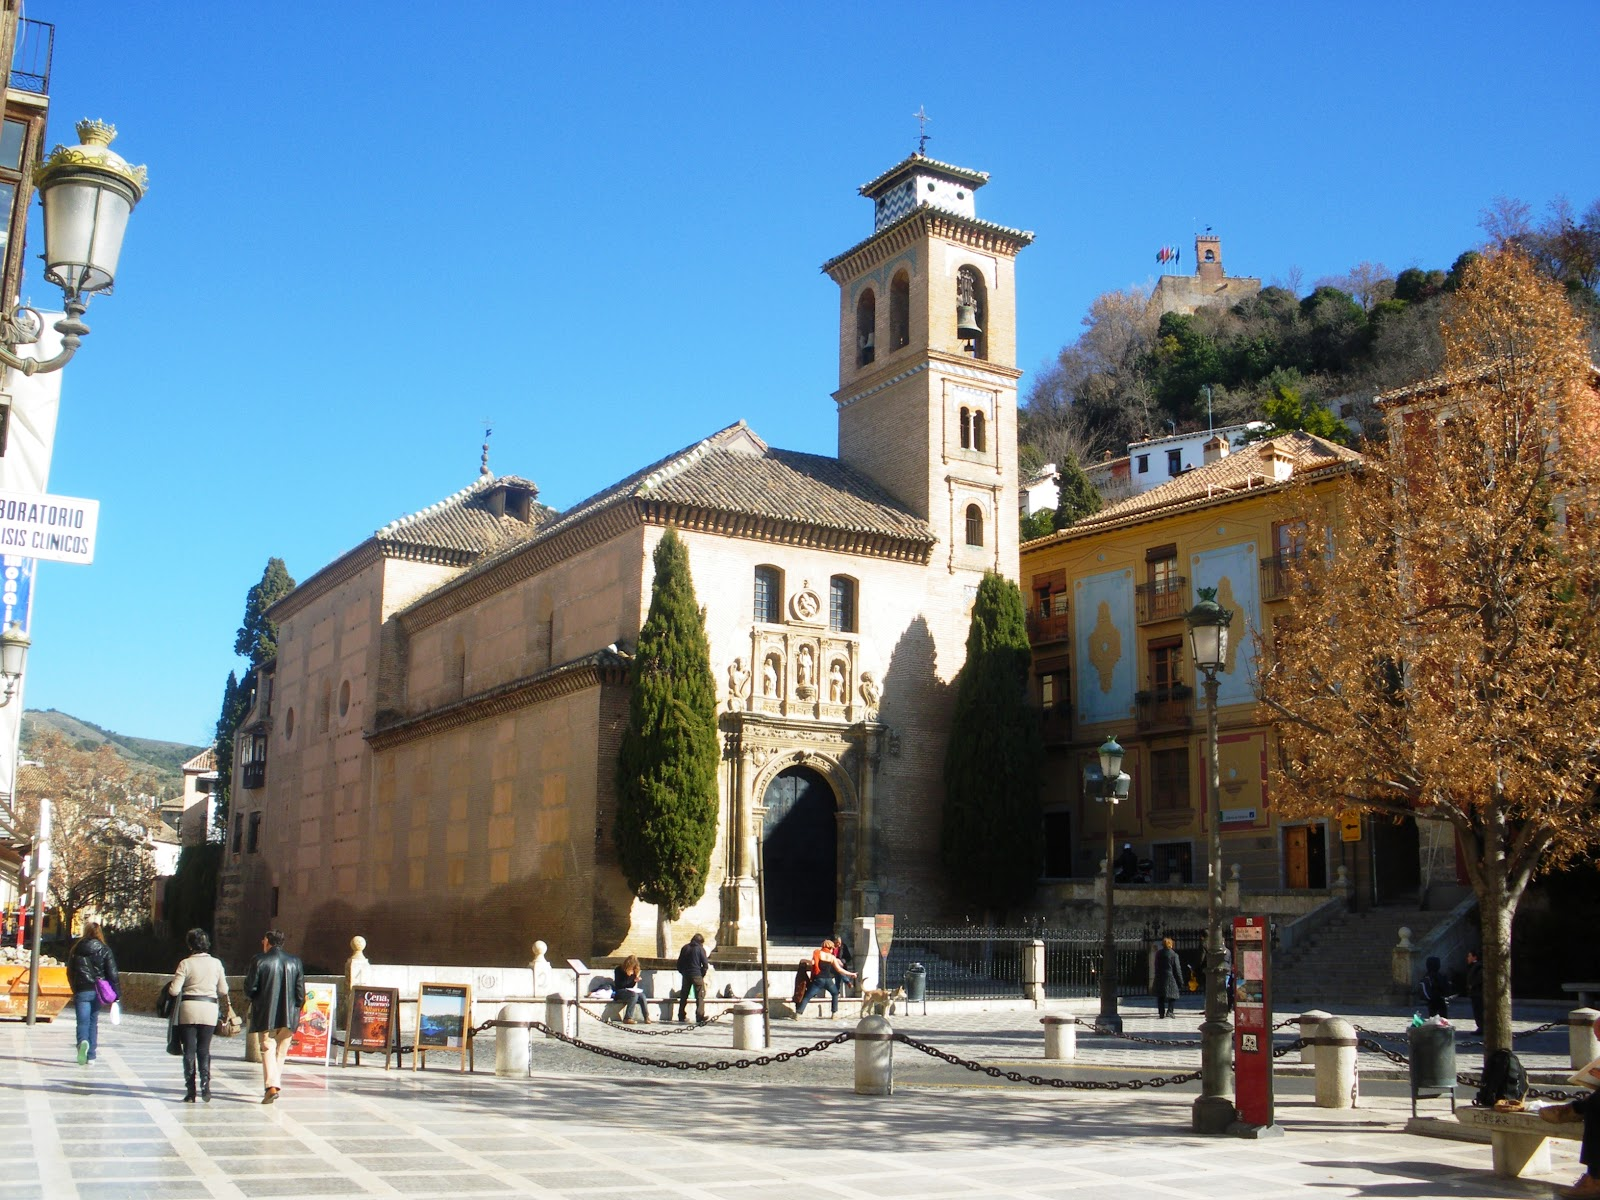 Plaza eliptica hras griego en Santa Fe-354